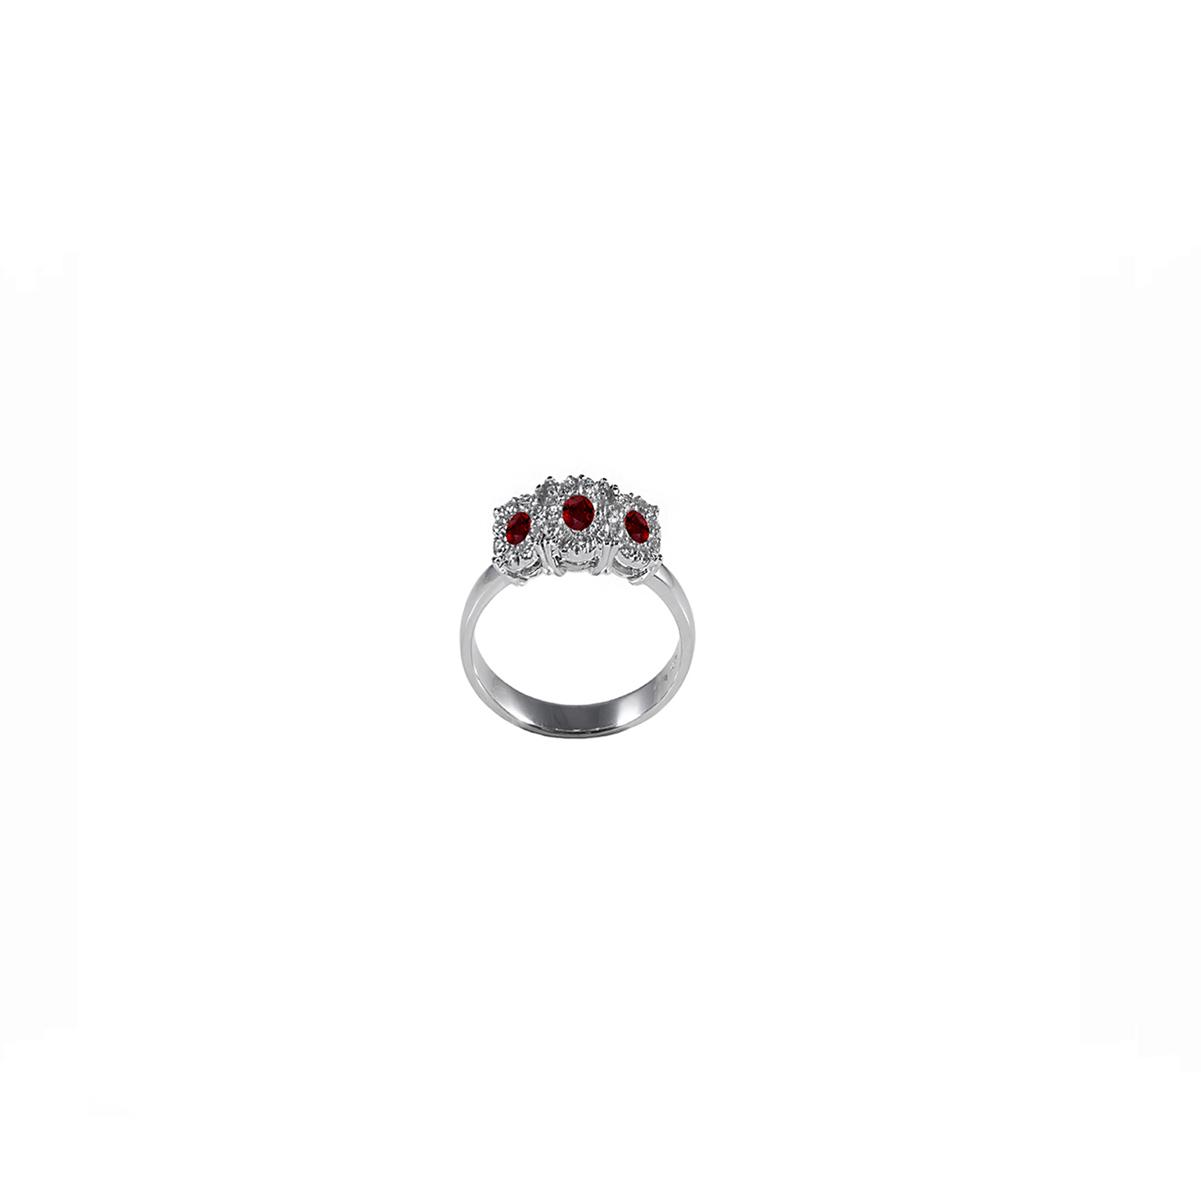 anello trilogy rubini e diamanti trf454r-565